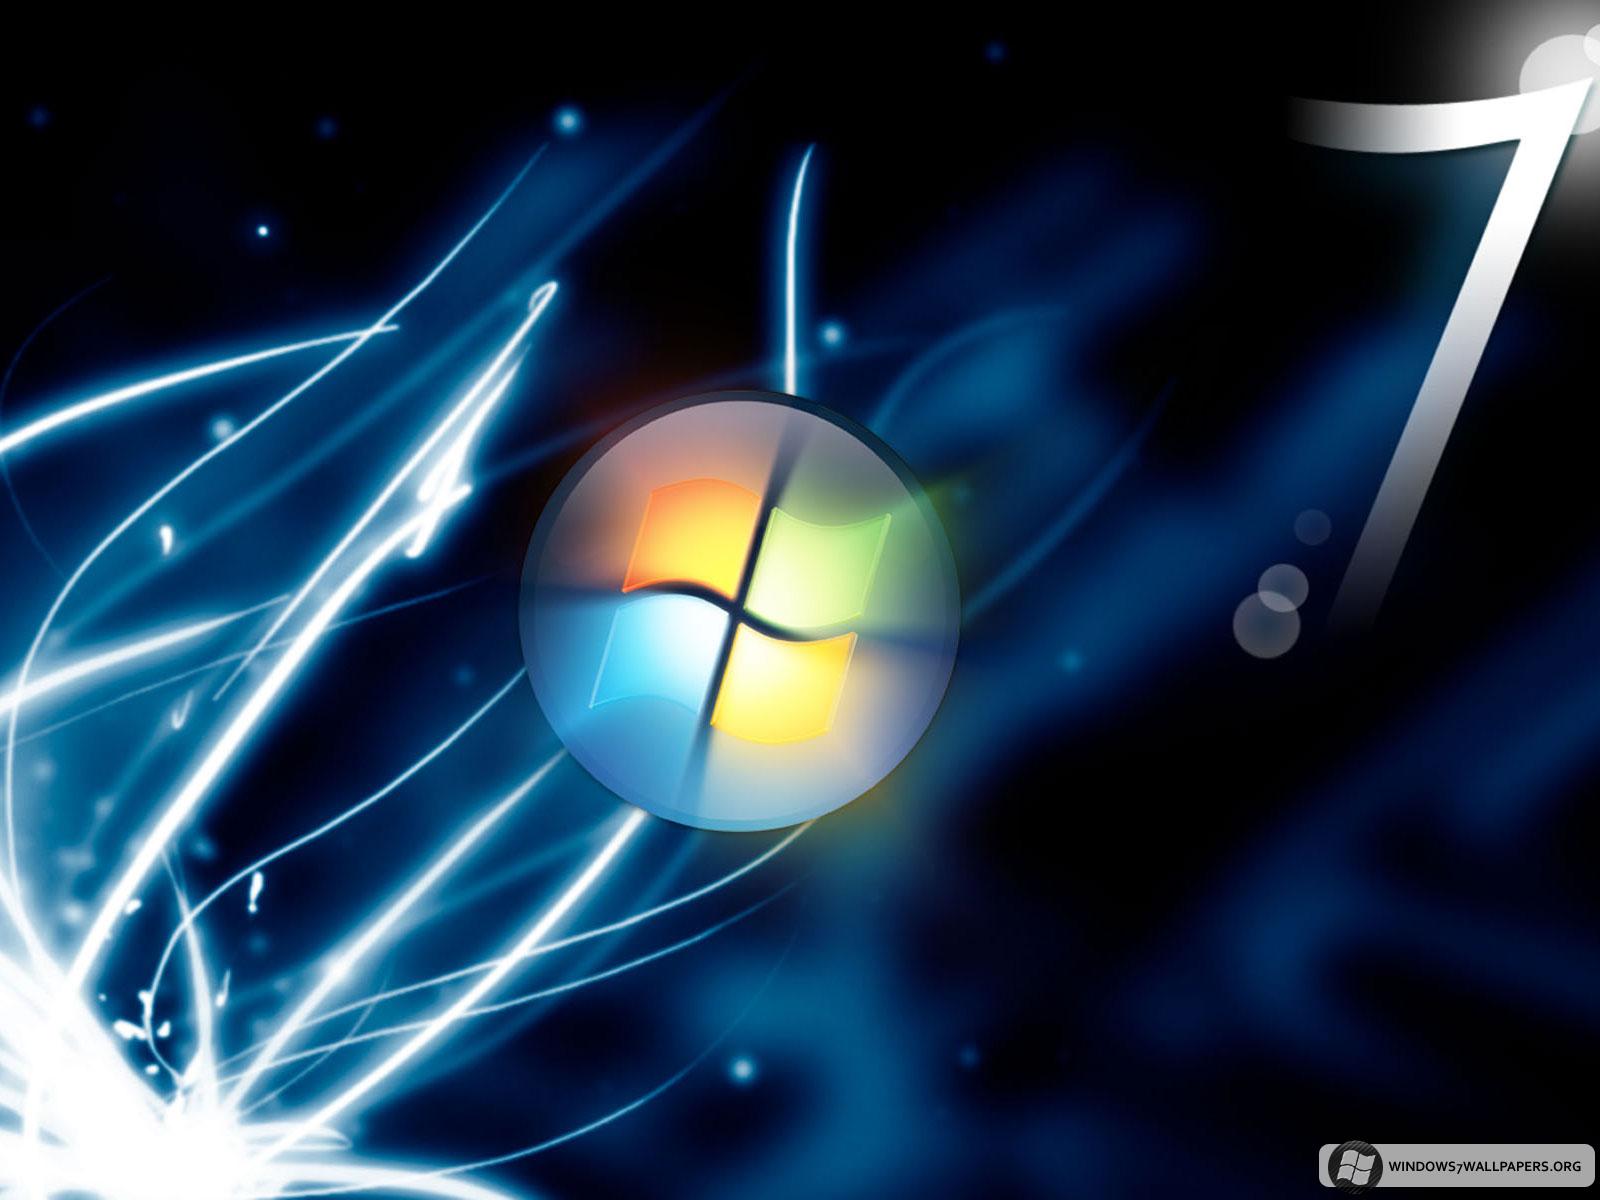 Trololo Blogg: Wallpaper Windows 7 Free Download